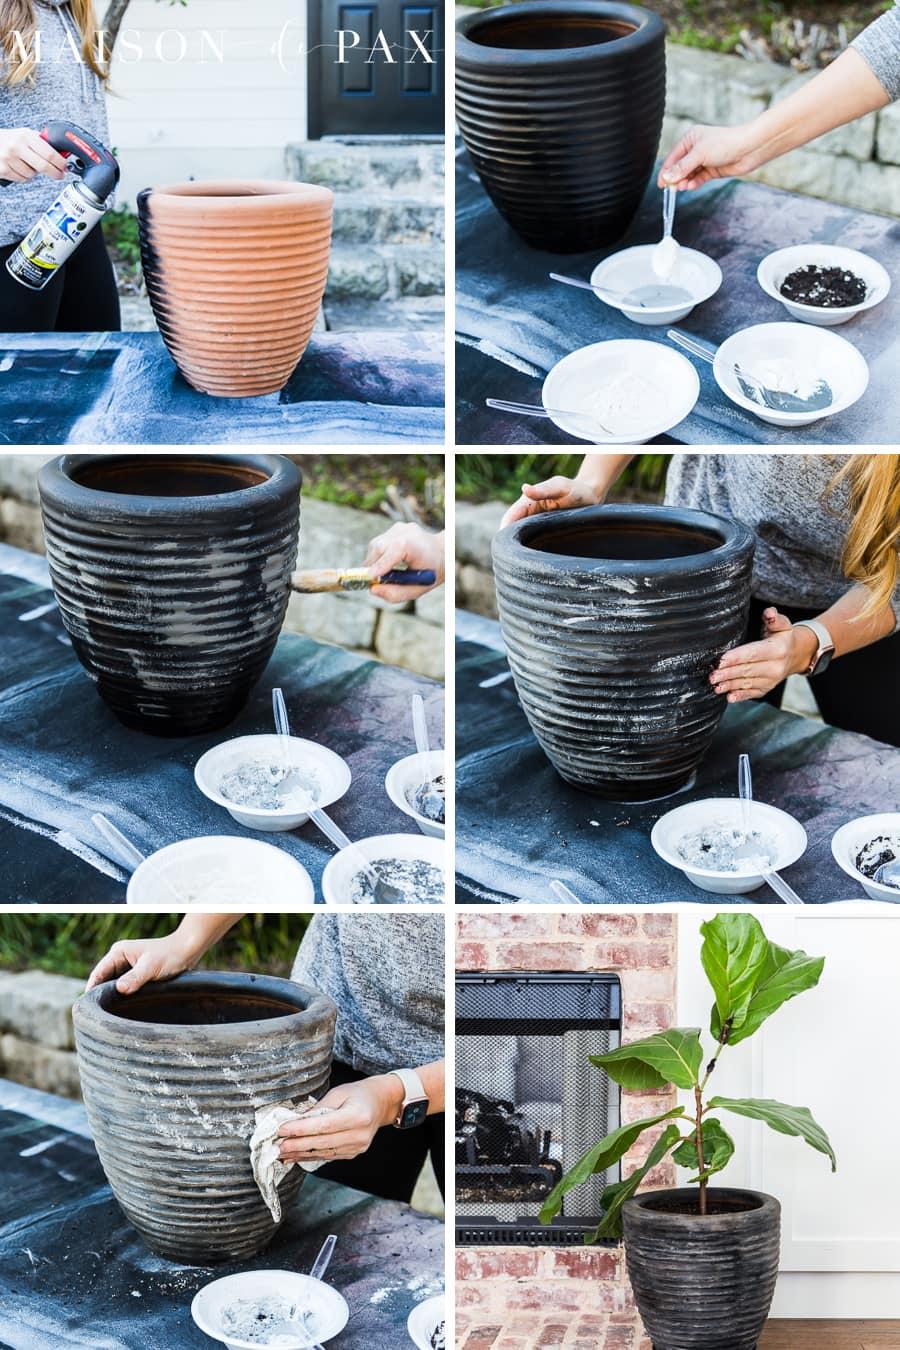 how to create a DIY aged terra cotta pot | Maison de Pax